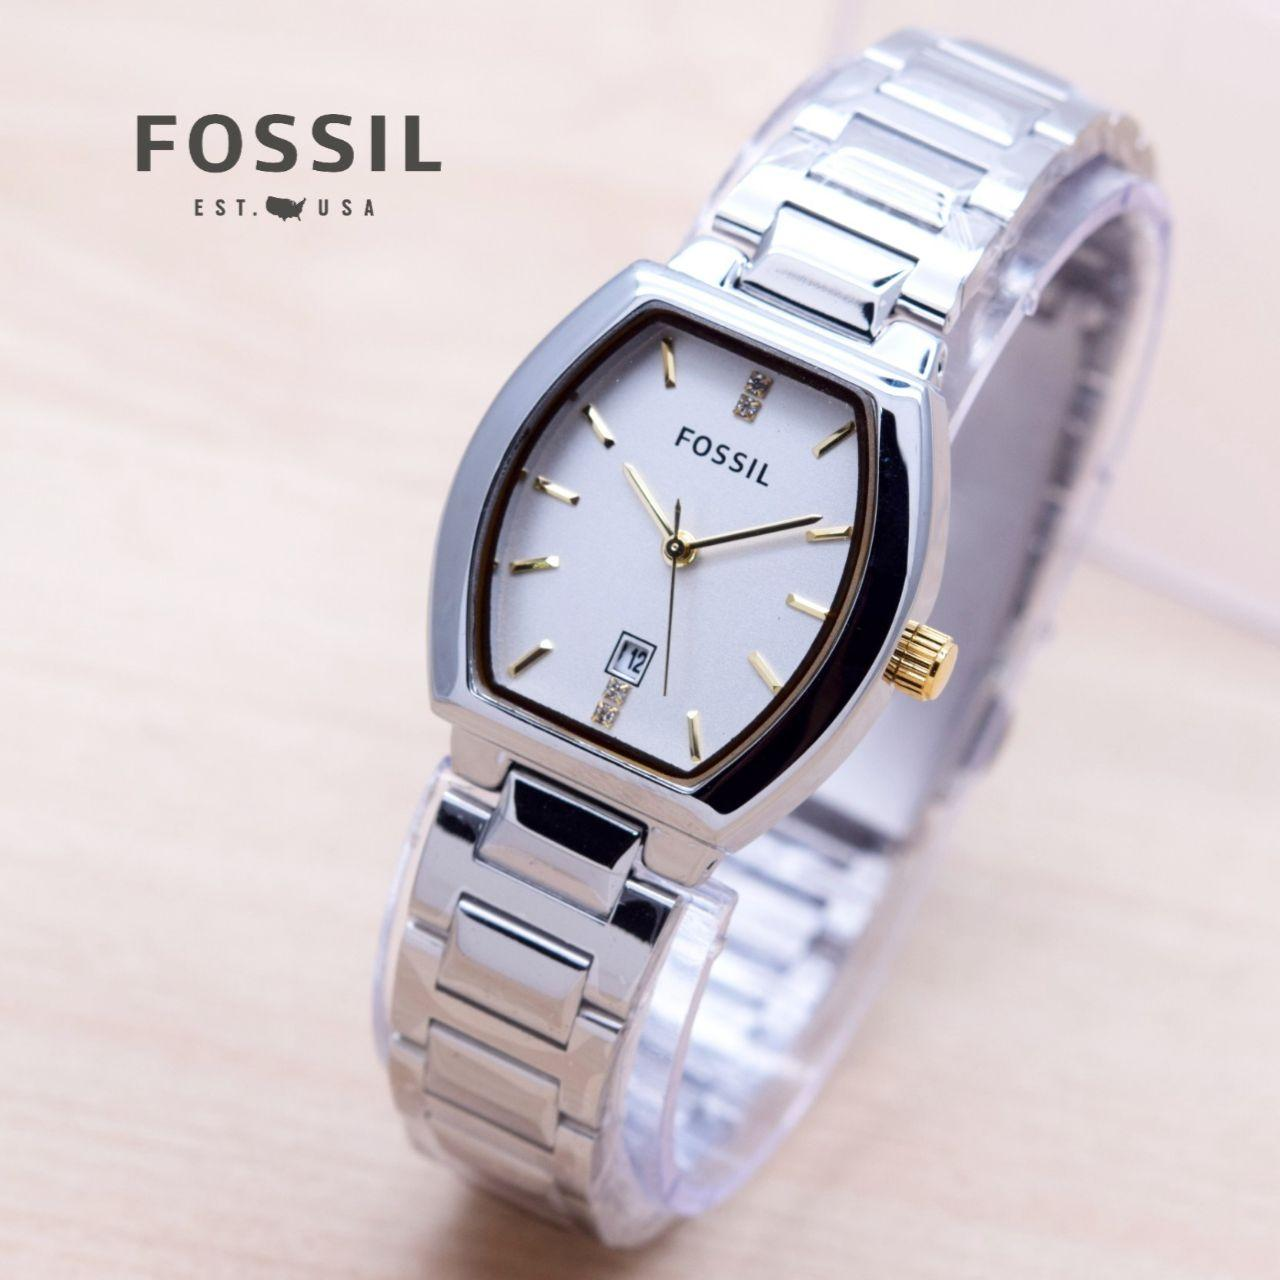 Harga Jual Fossil Es3202 Jam Tangan Wanita Silver Stainless Steel Am4481 Original Cewek Ladies Sk369 Leather Blue Rosegoldidr153000 Rp 155000